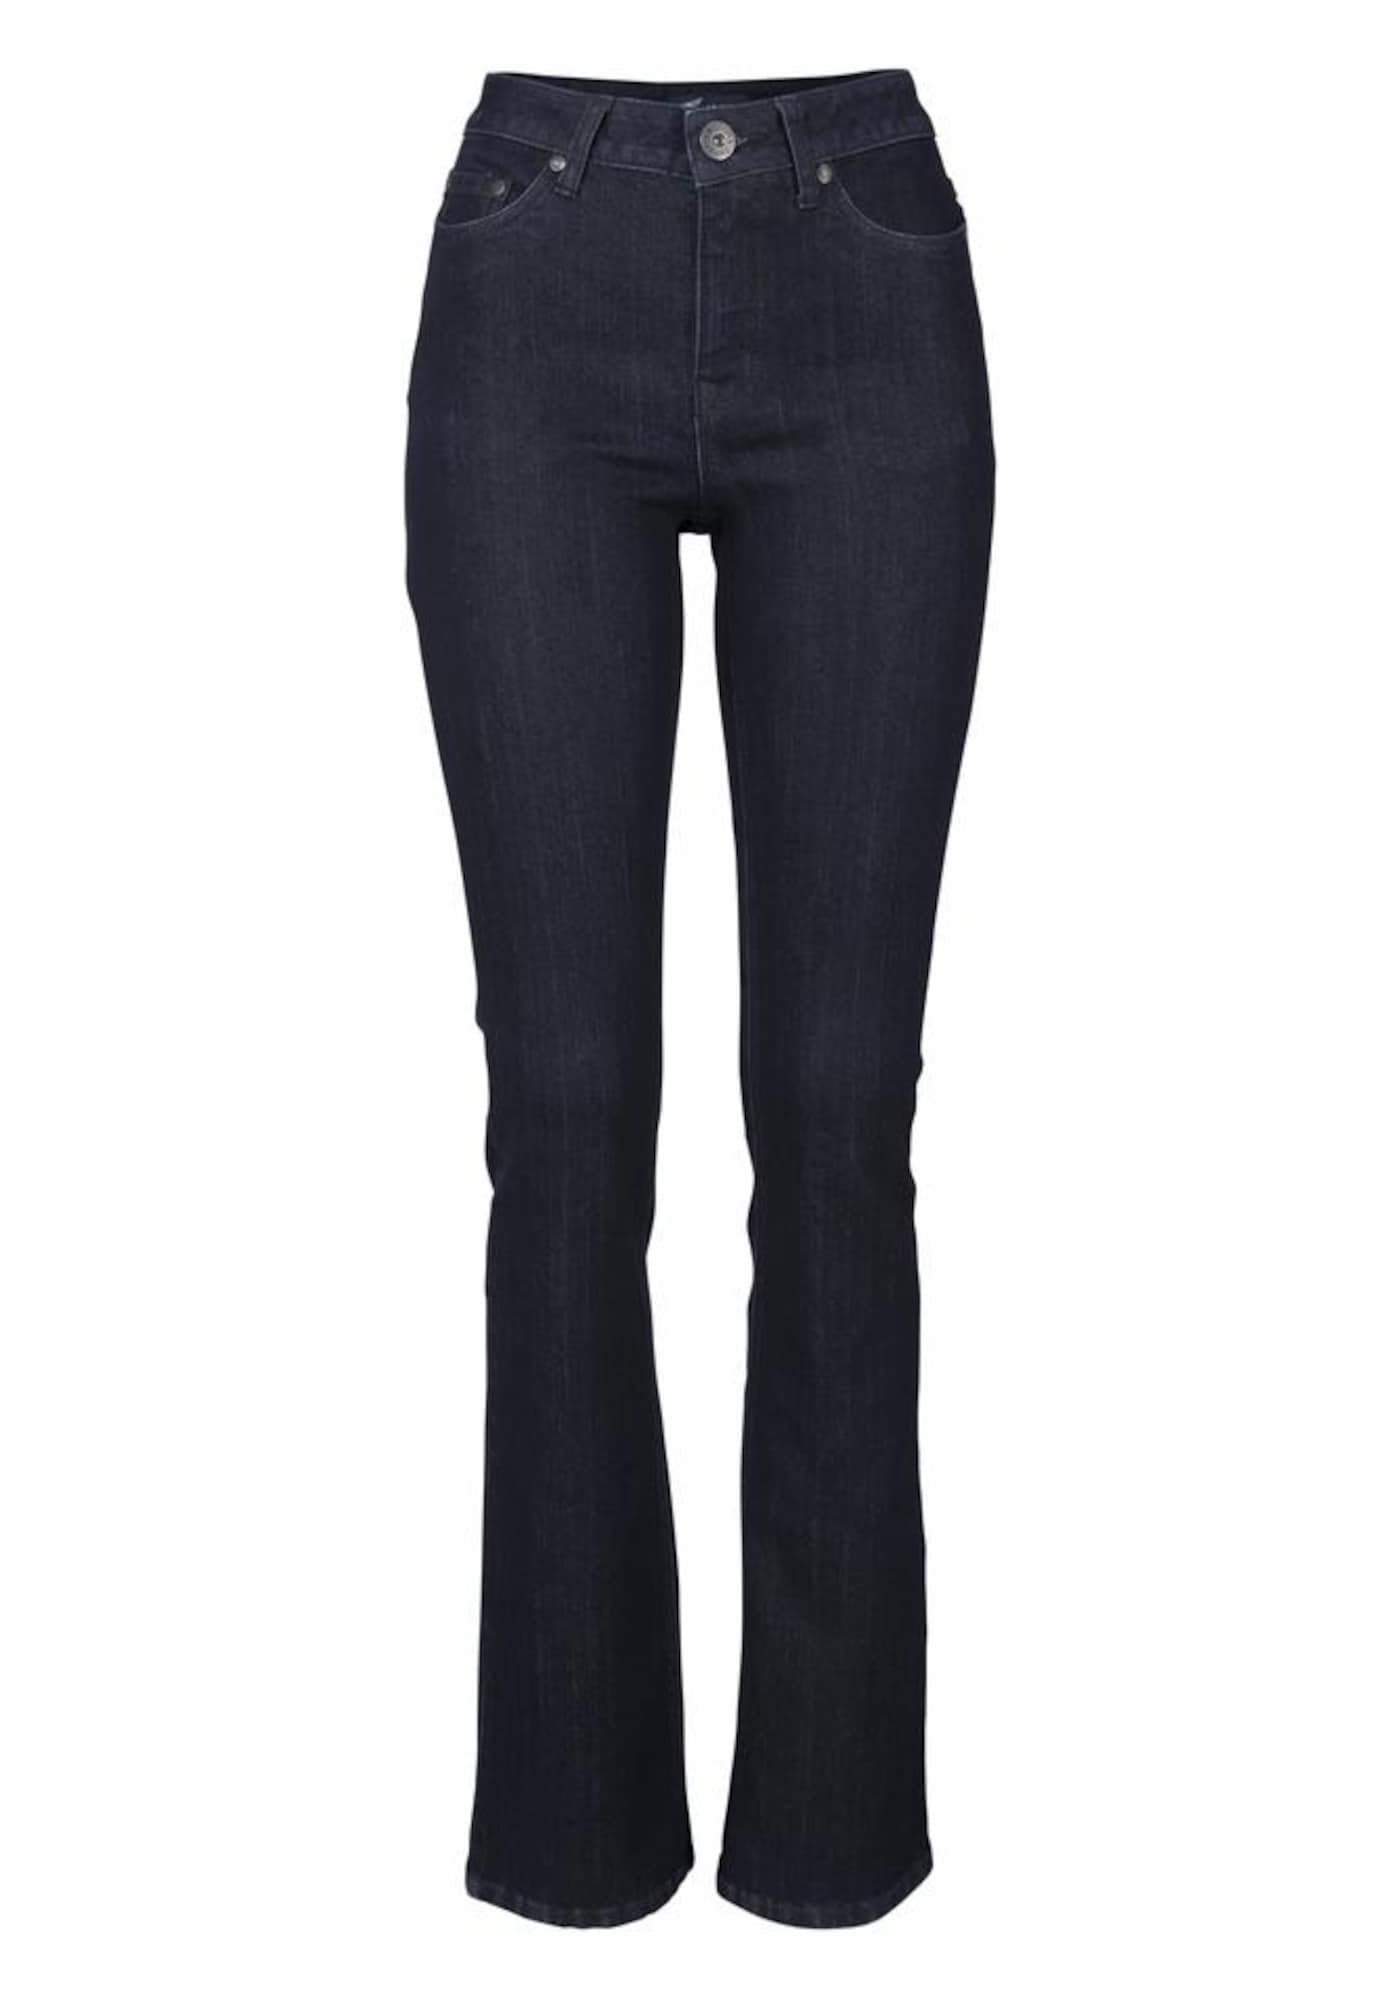 Jeans 'Bootcut' | Bekleidung > Hosen > Bootcut-Hosen & Schlaghosen | ARIZONA